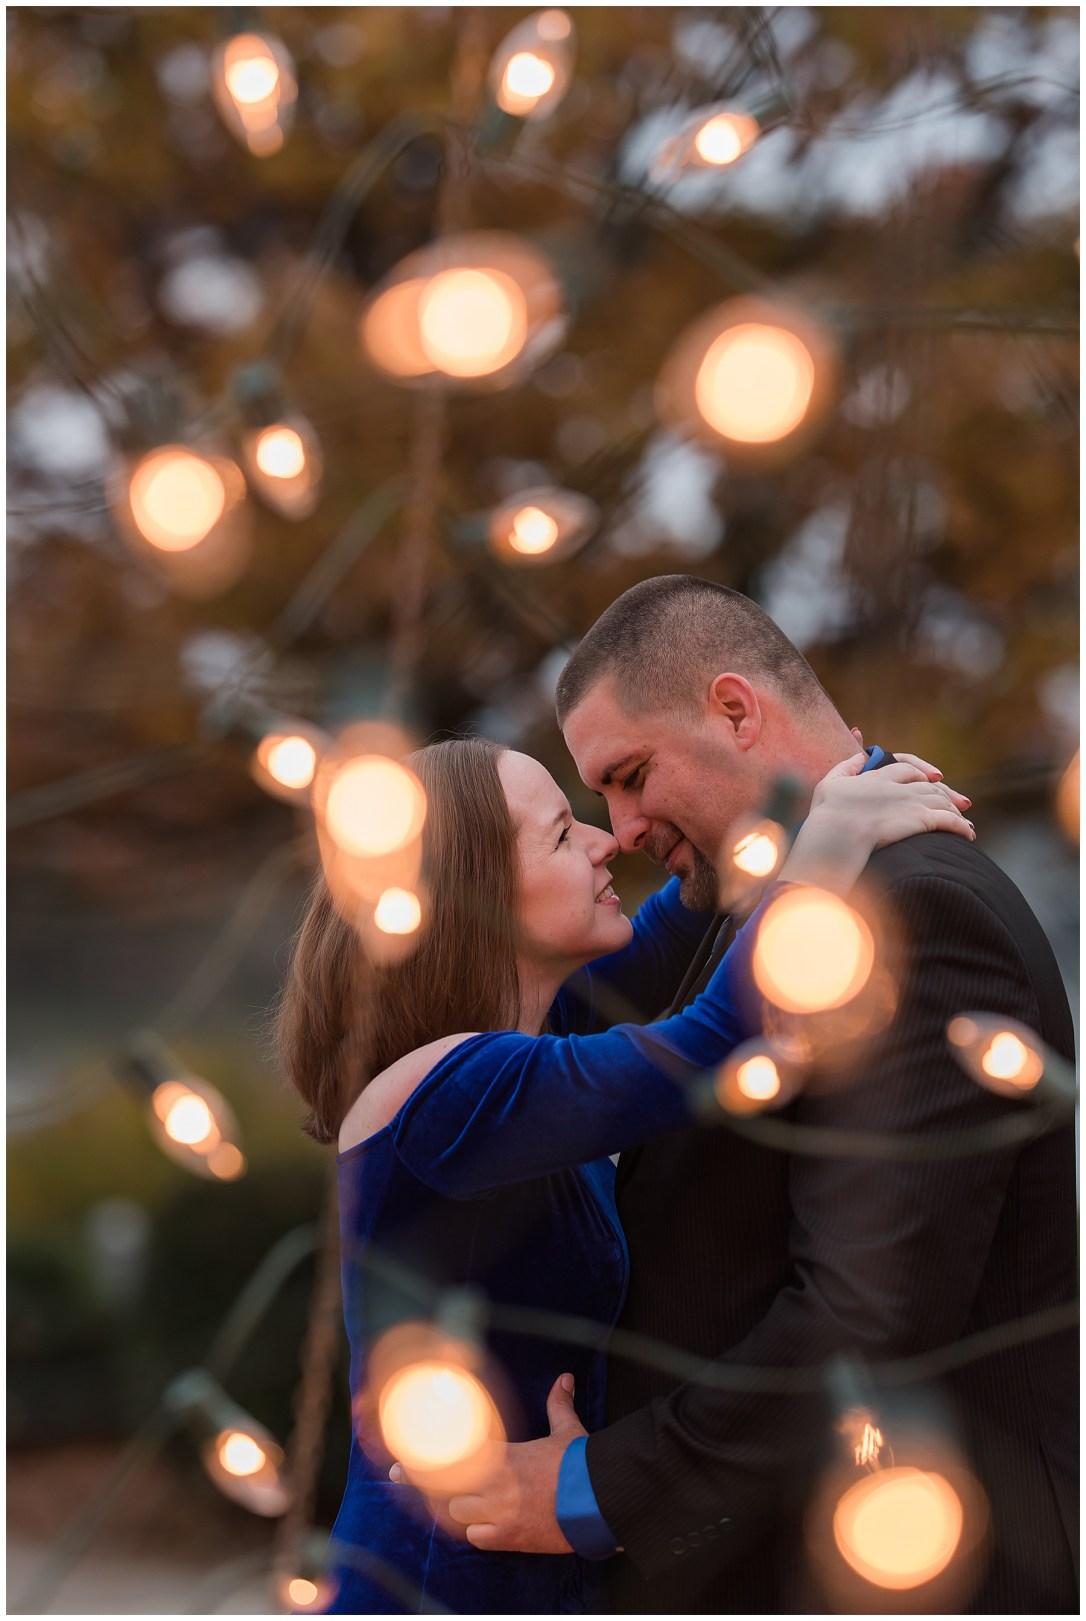 Christmas light engagement photos